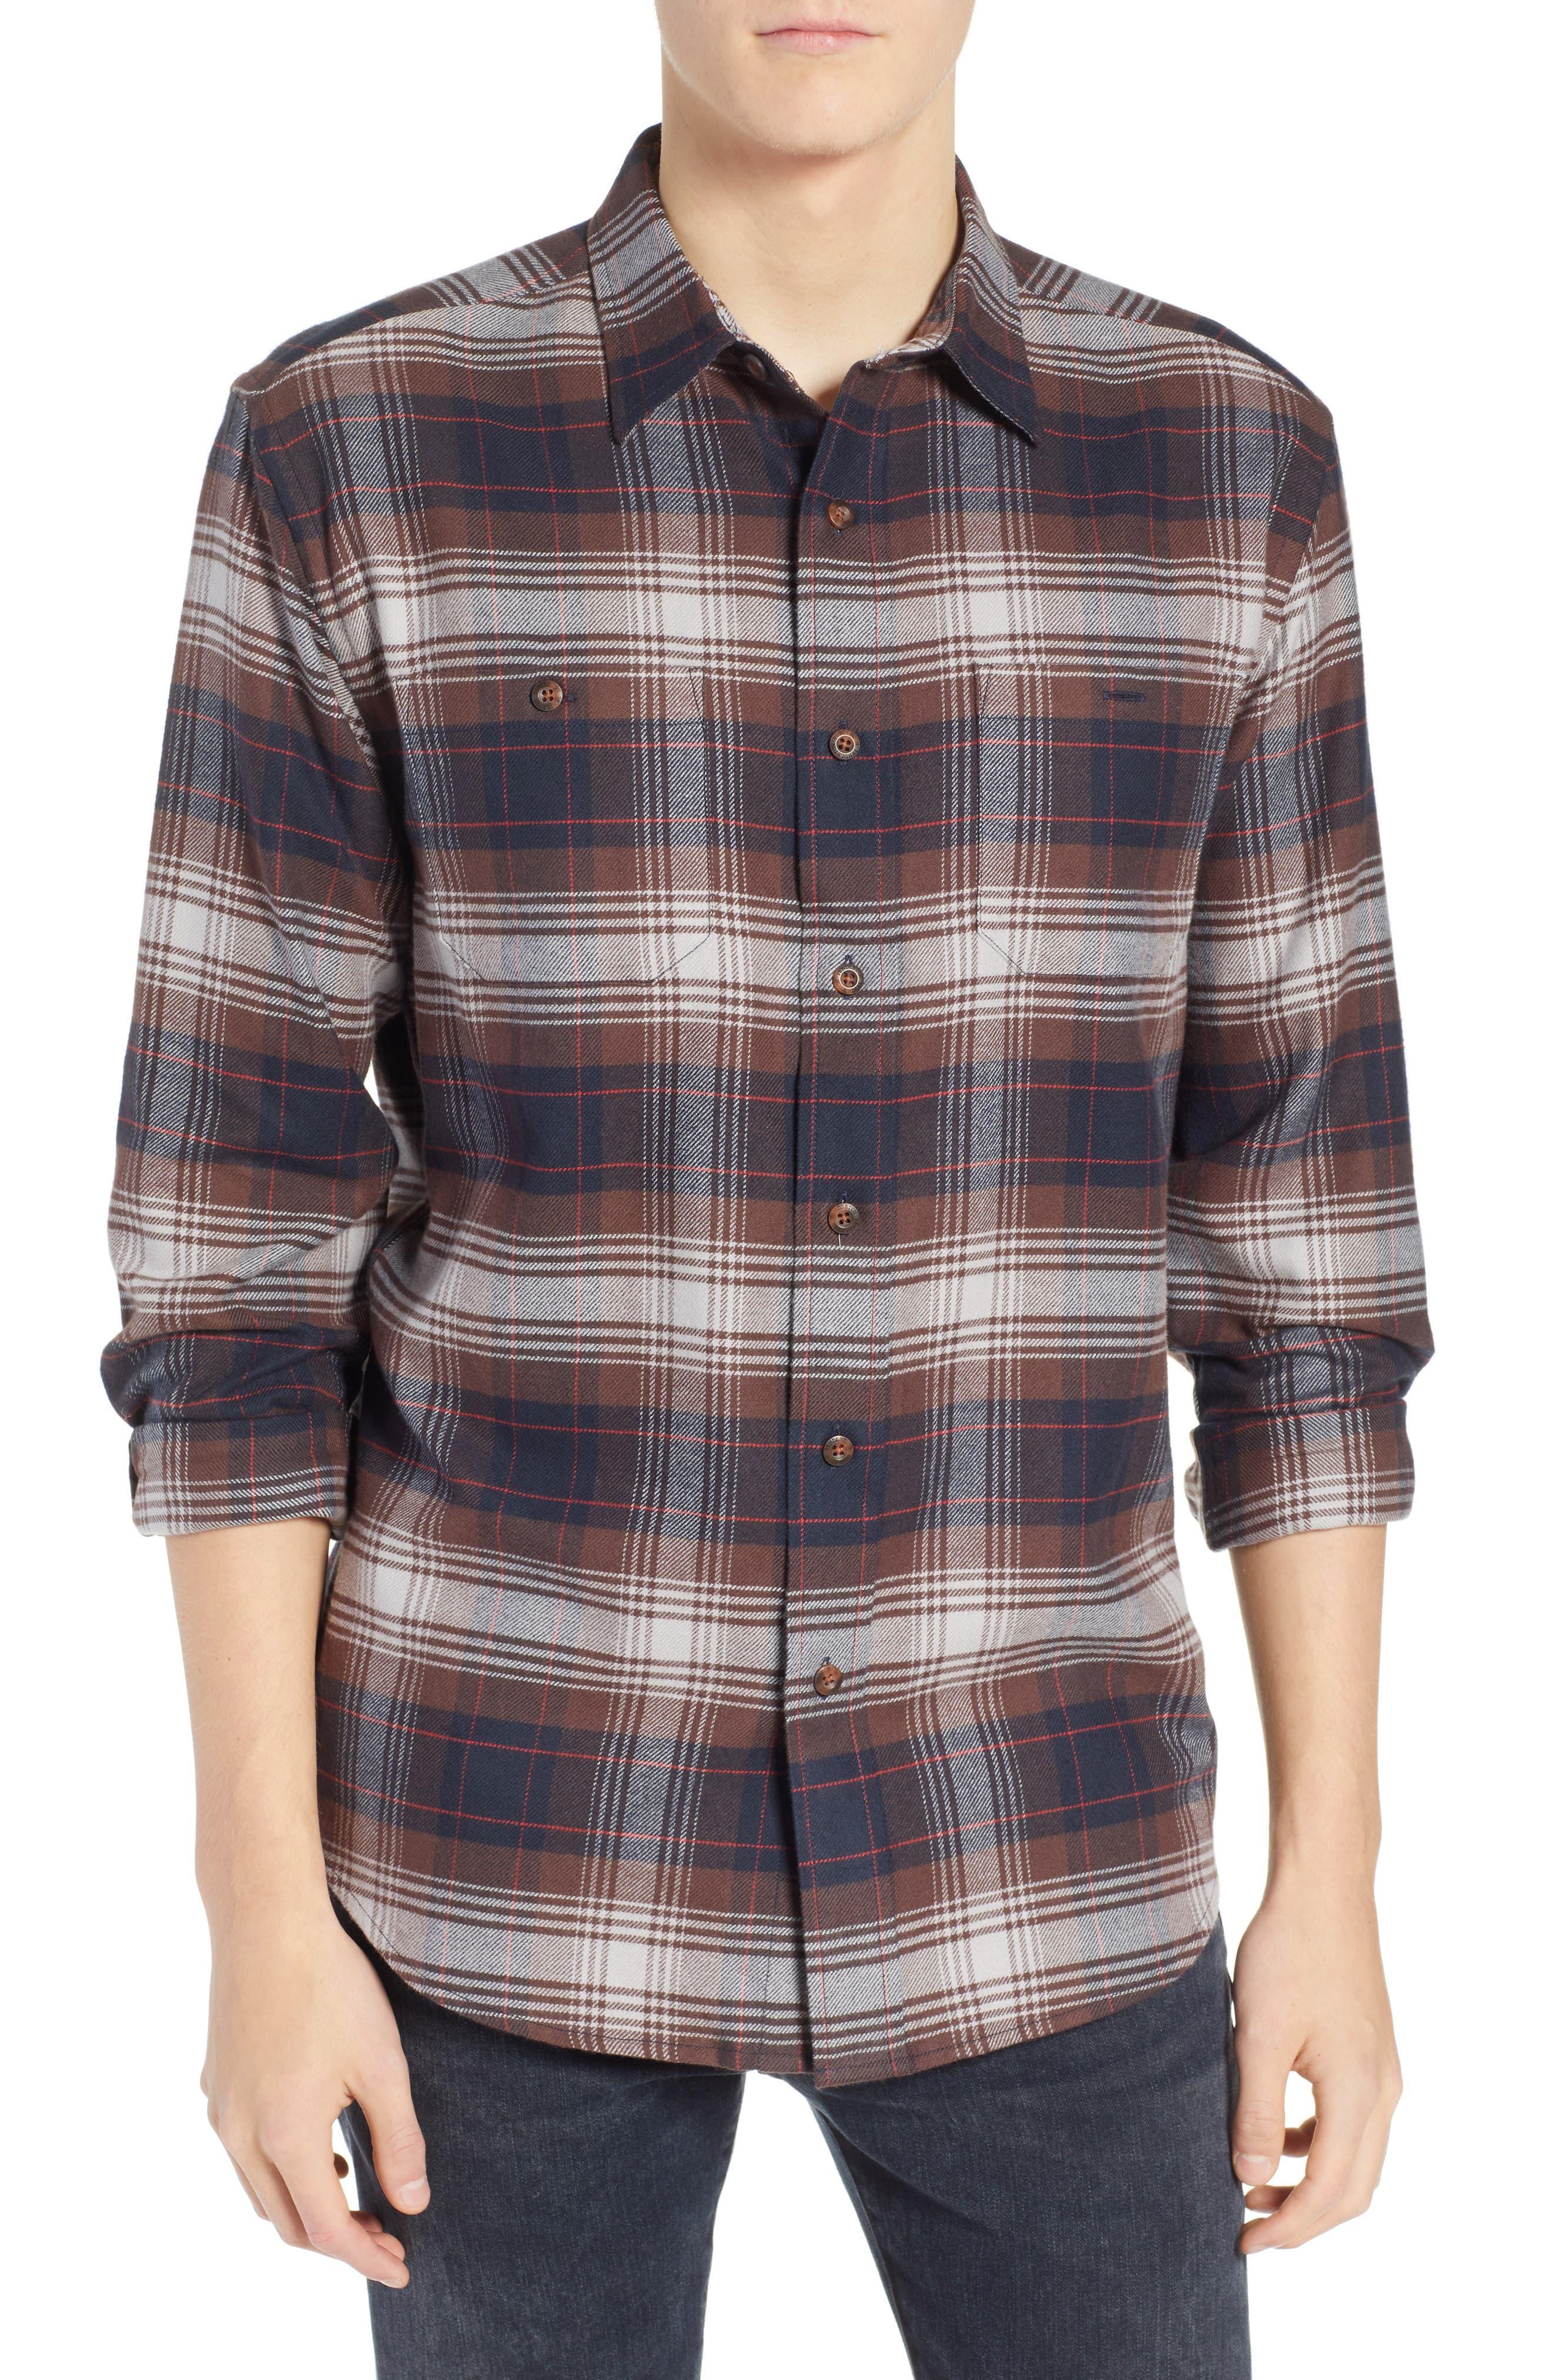 Pendleton Hawthorne Plaid Flannel Shirt, Brown